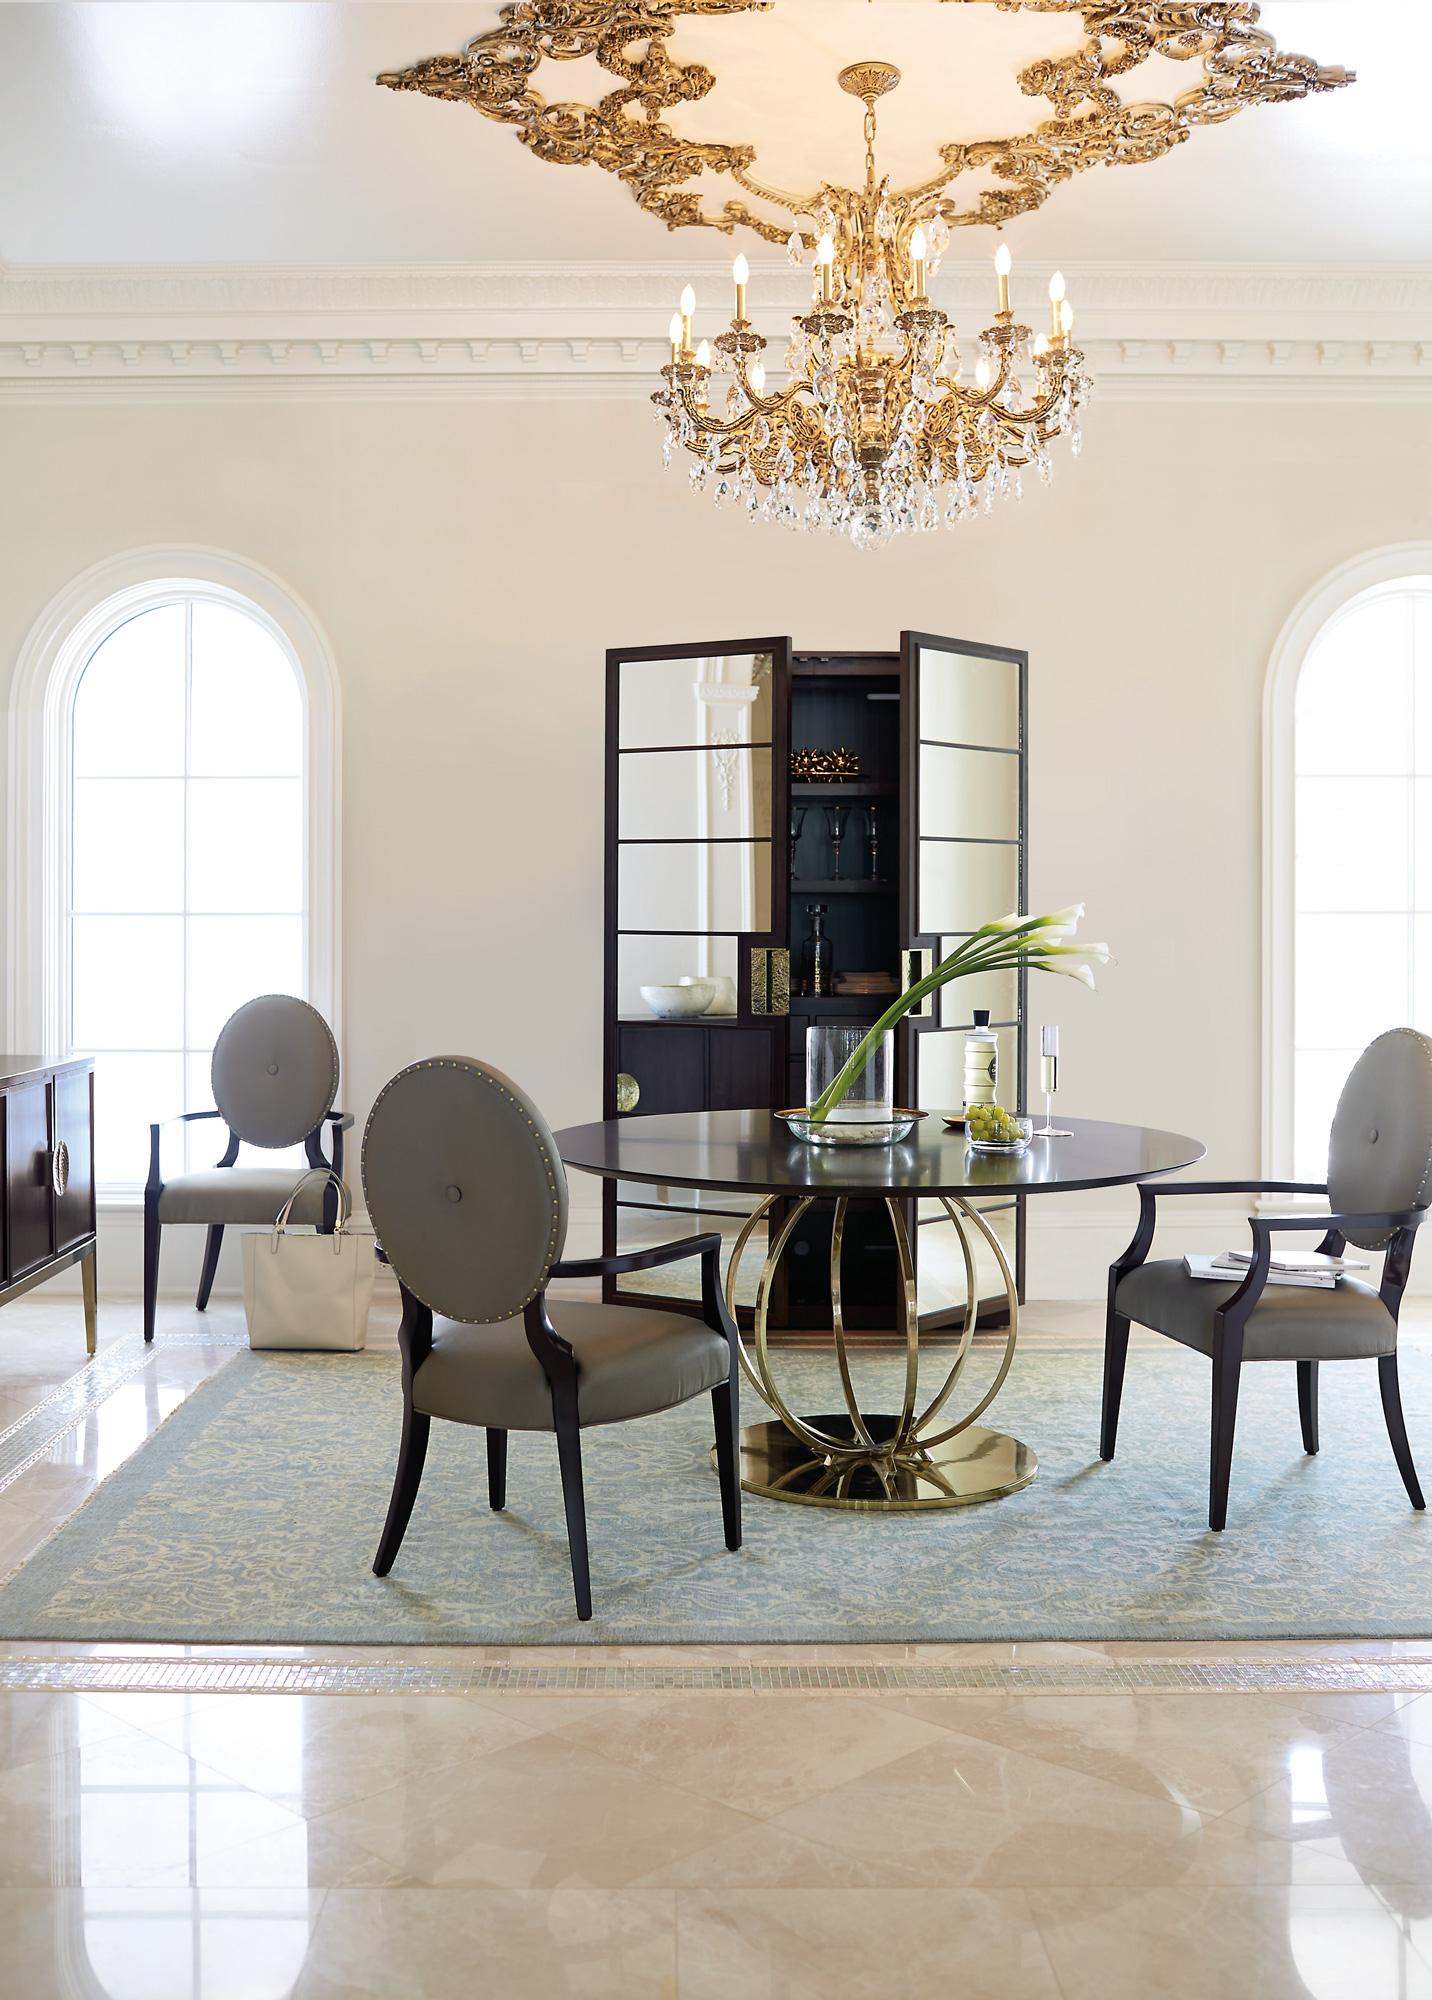 Bernhardt Jet Set Round Dining Table Arm Chairs Display